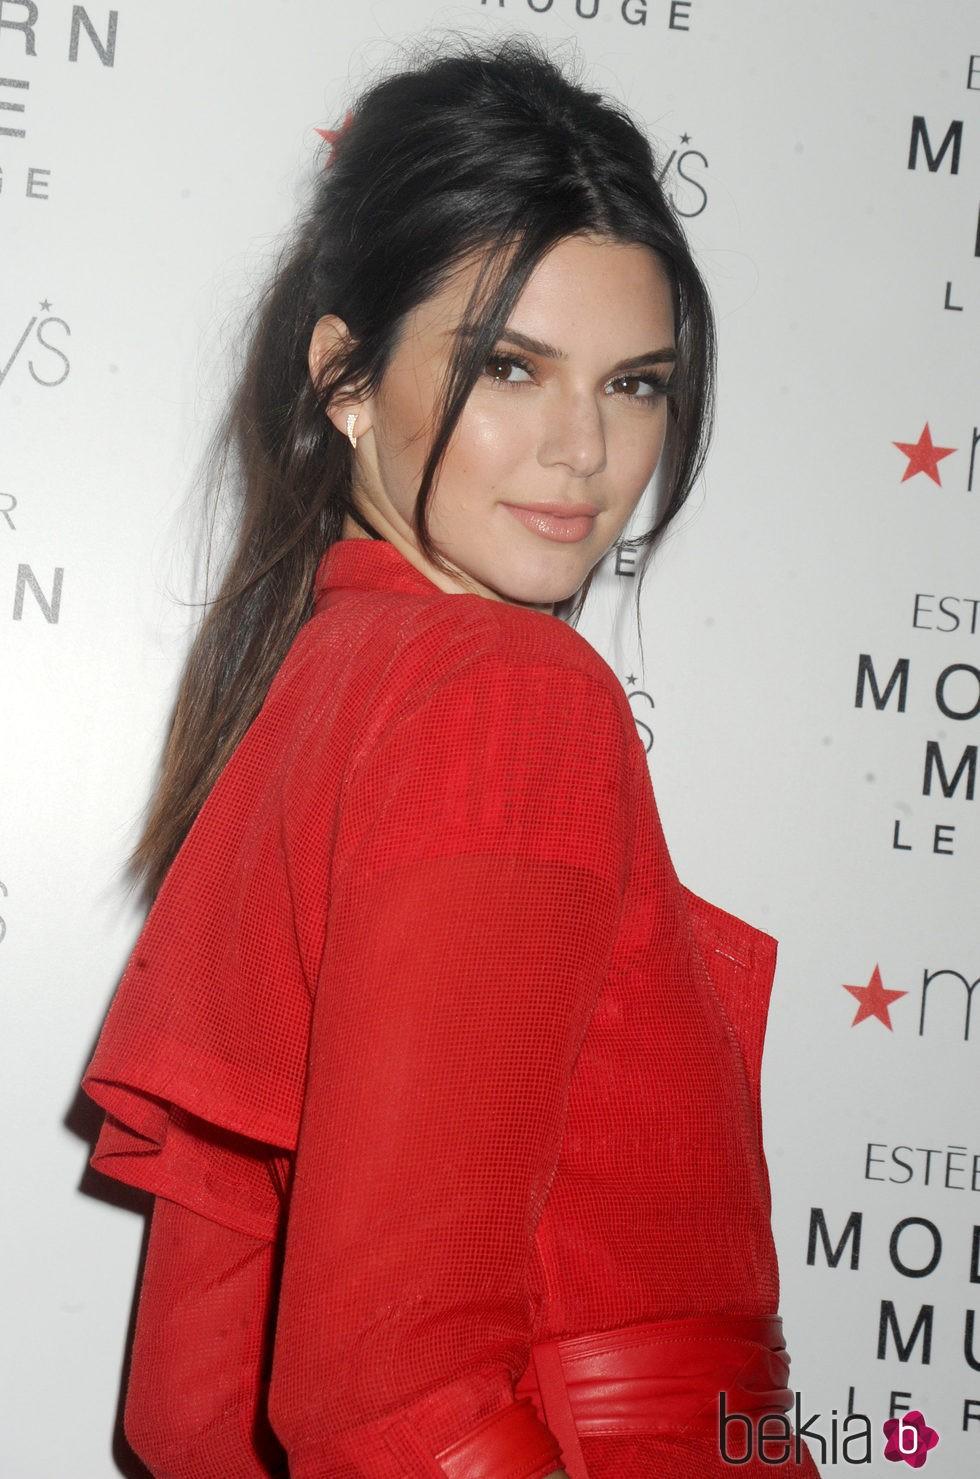 Recogido De Kendall Jenner Con Dos Flequillos Los Mejores Peinados - Peinados-flequillo-recogido